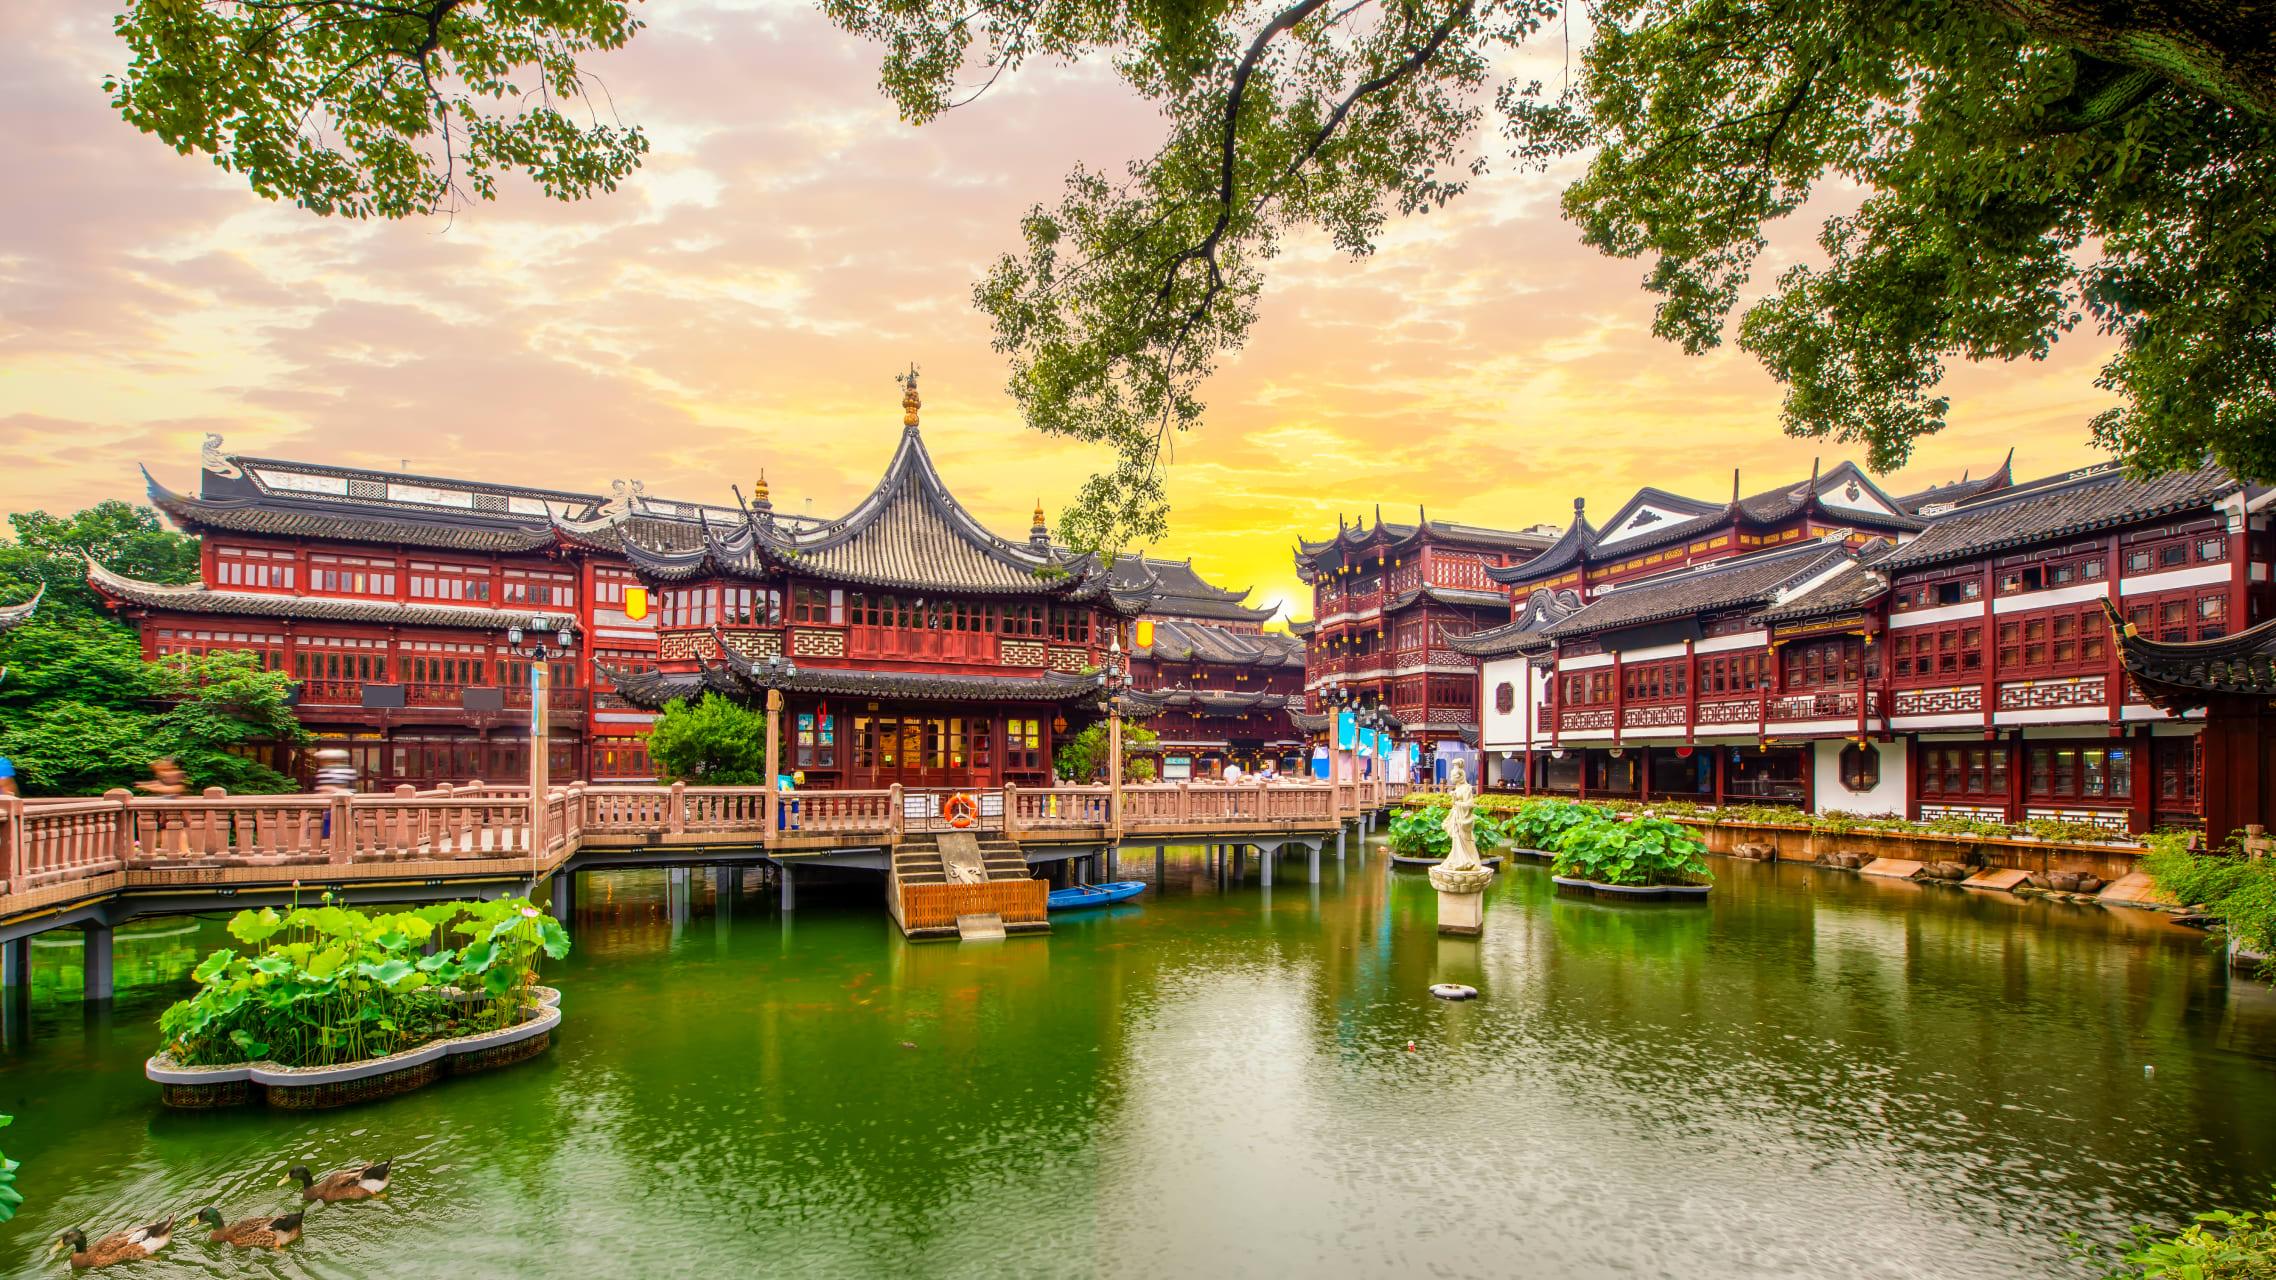 Shanghai - Yuyuan Garden: Shanghai 500 Year-old Luxurious Home